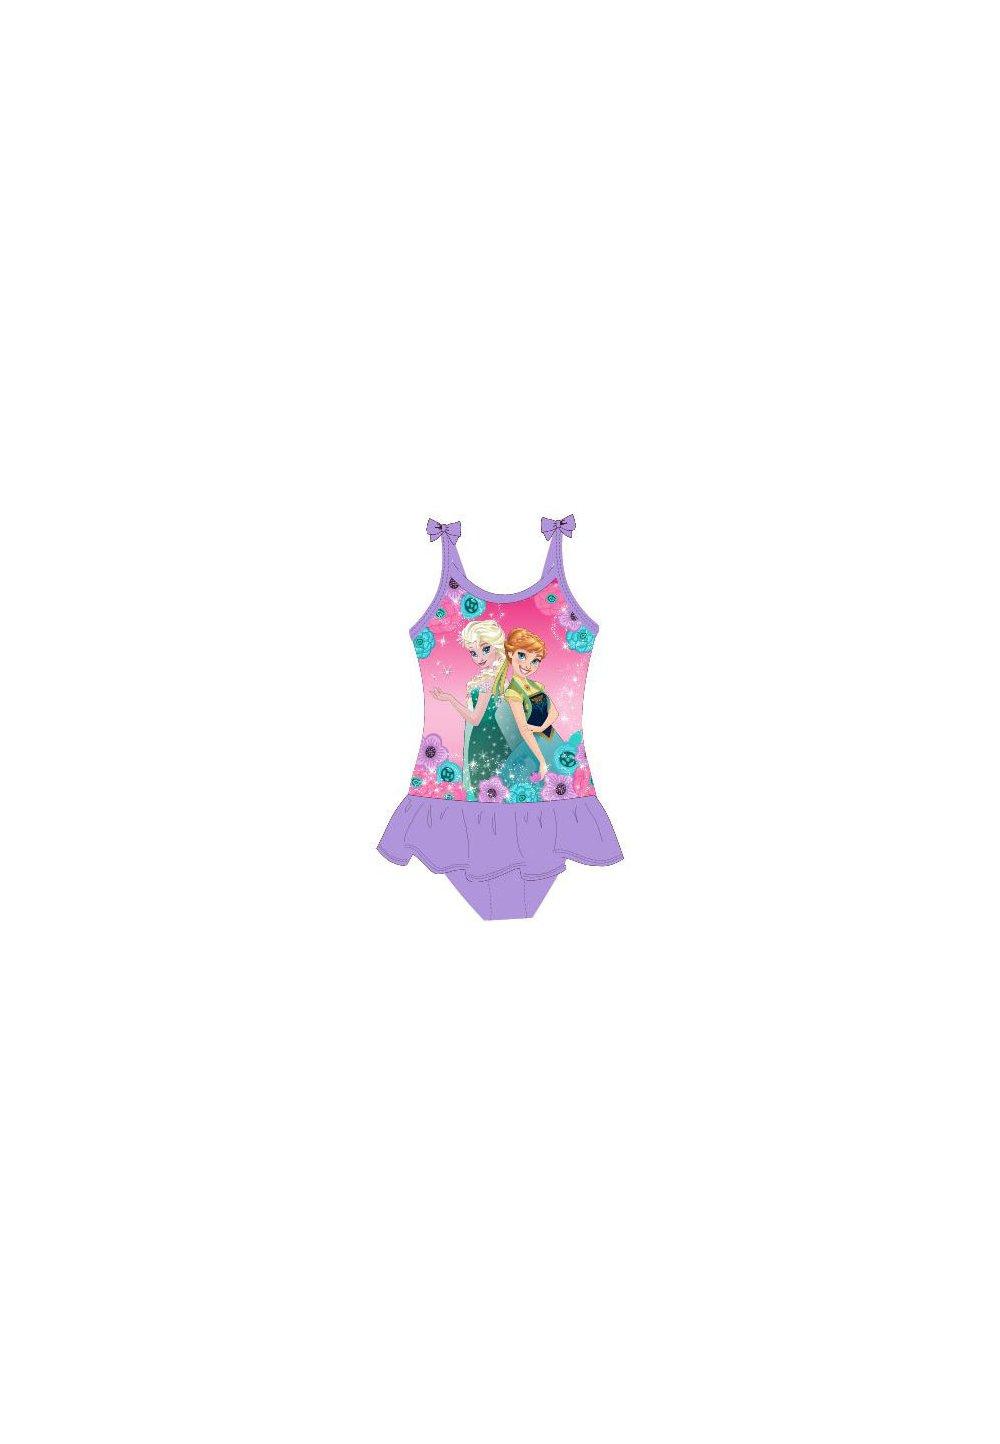 Costum de baie intreg, mov, Frozen, cu fundite imagine